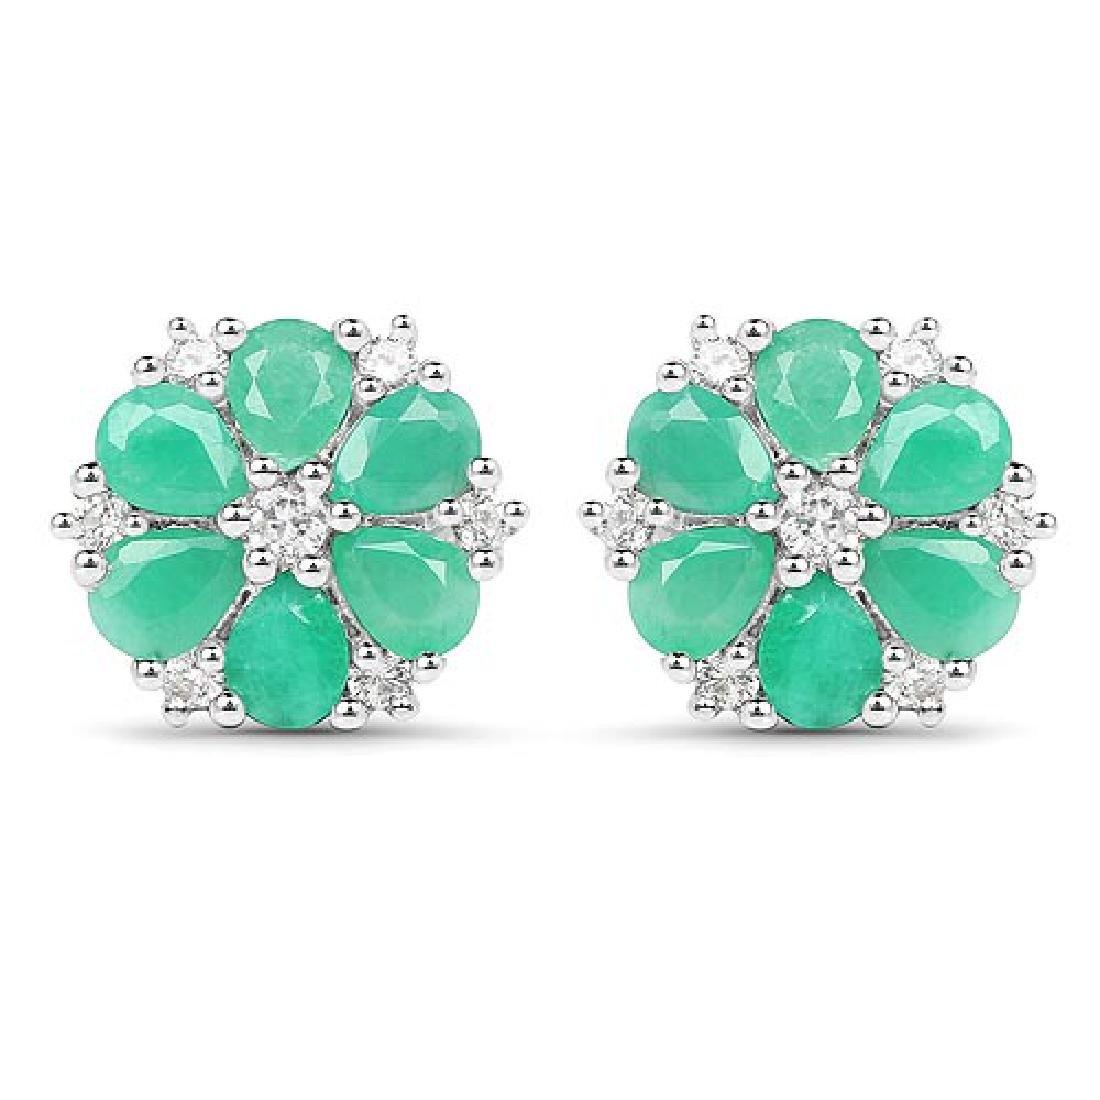 2.02 Carat Genuine Emerald and White Zircon .925 Sterli